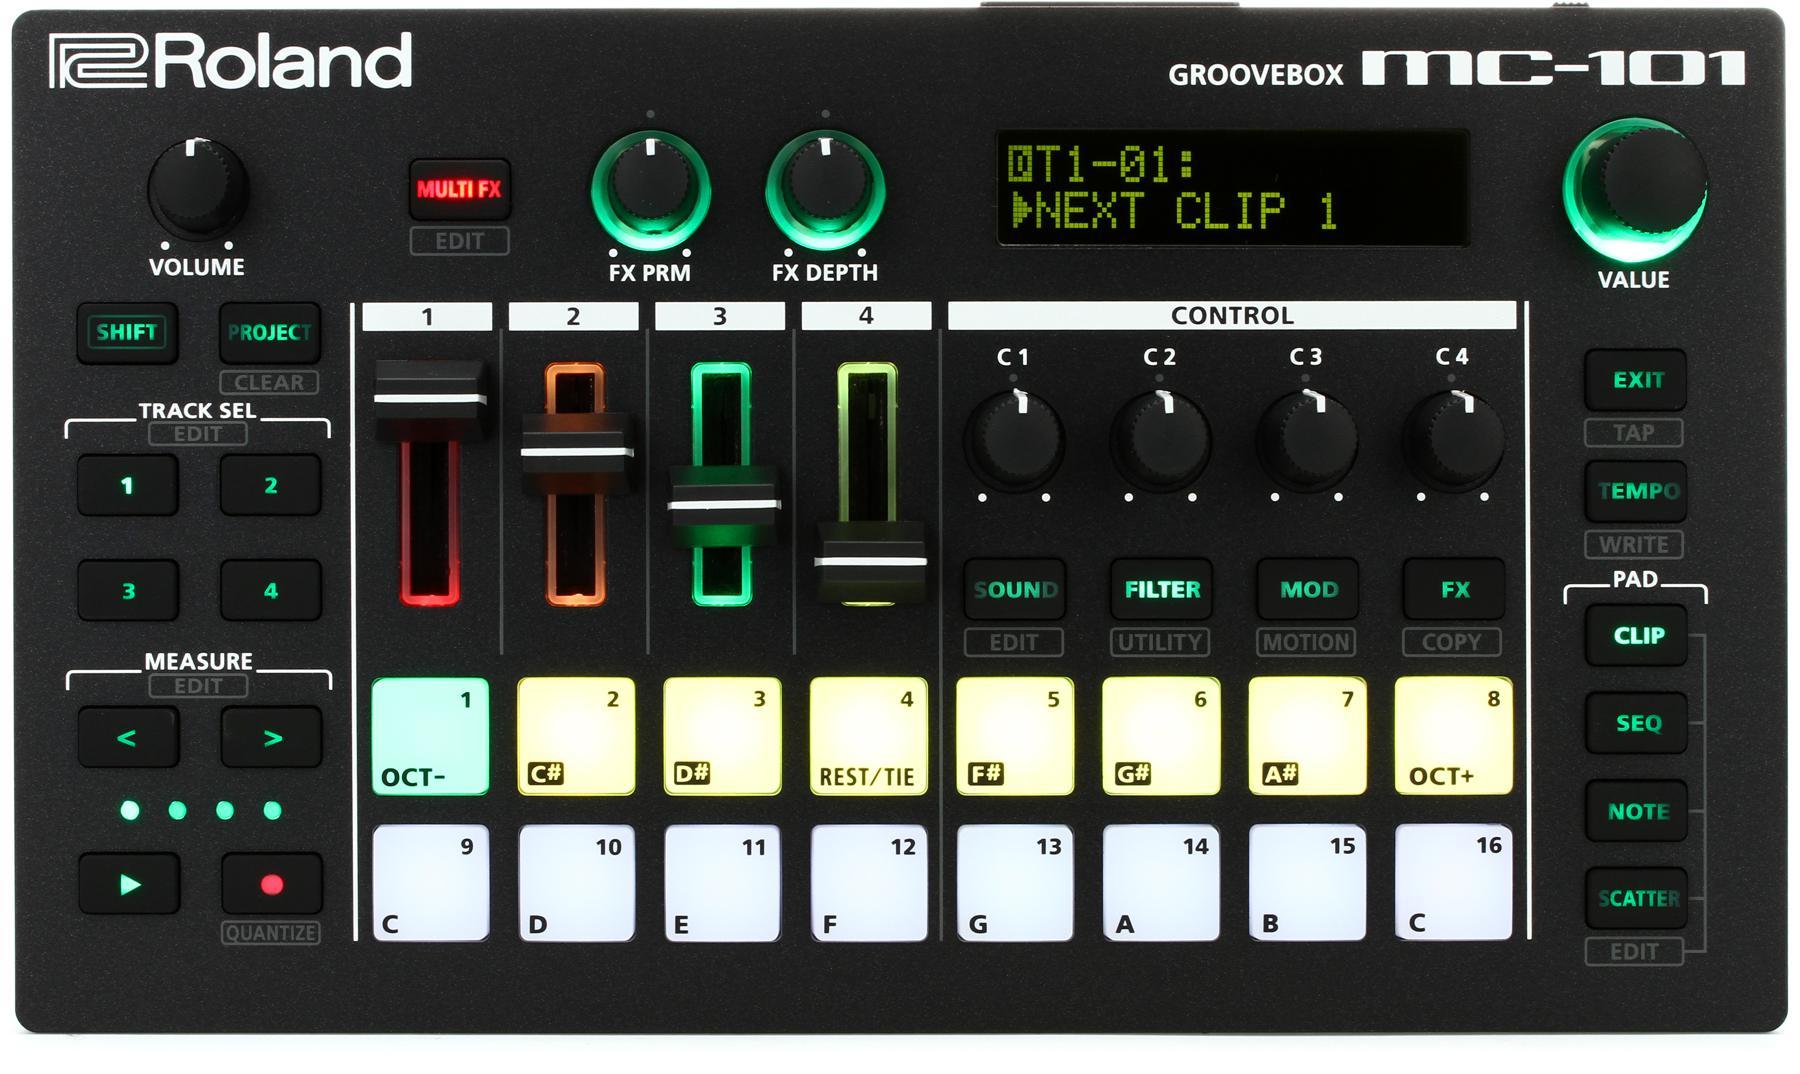 5. Roland MC-101 Groovebox